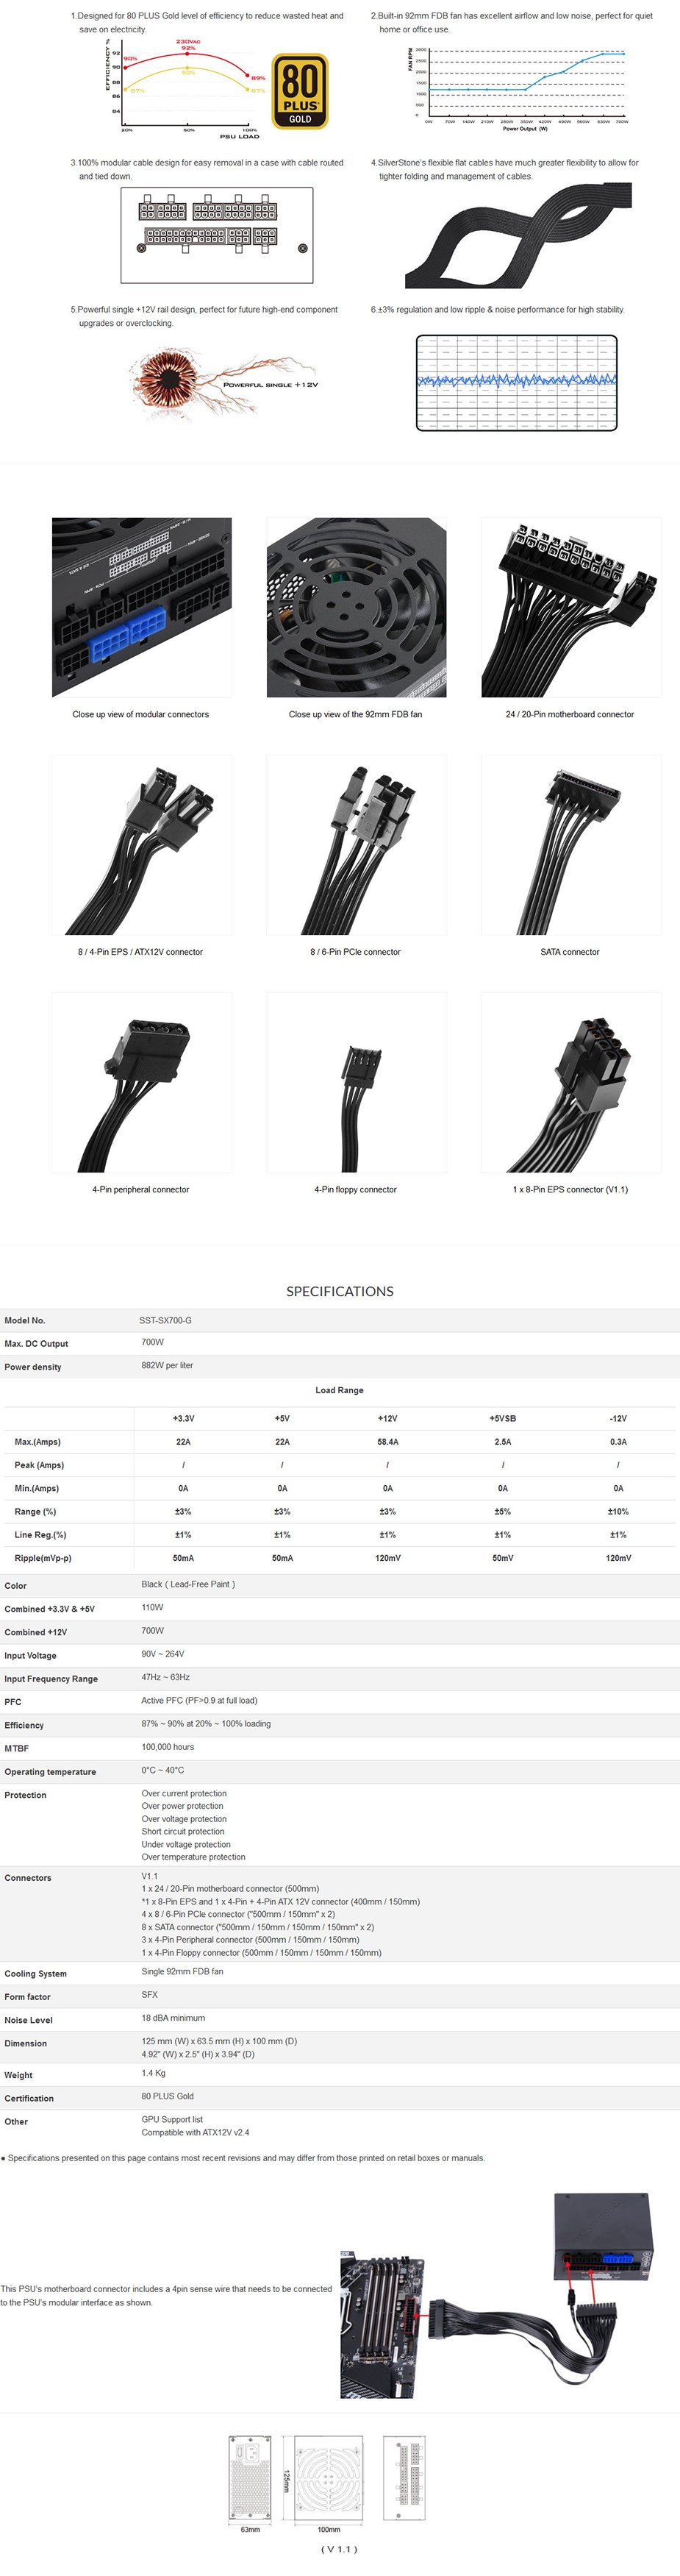 SilverStone SFX SX700-G V1.1 700W 80+ Gold Full Modular Power Supply - Overview 1